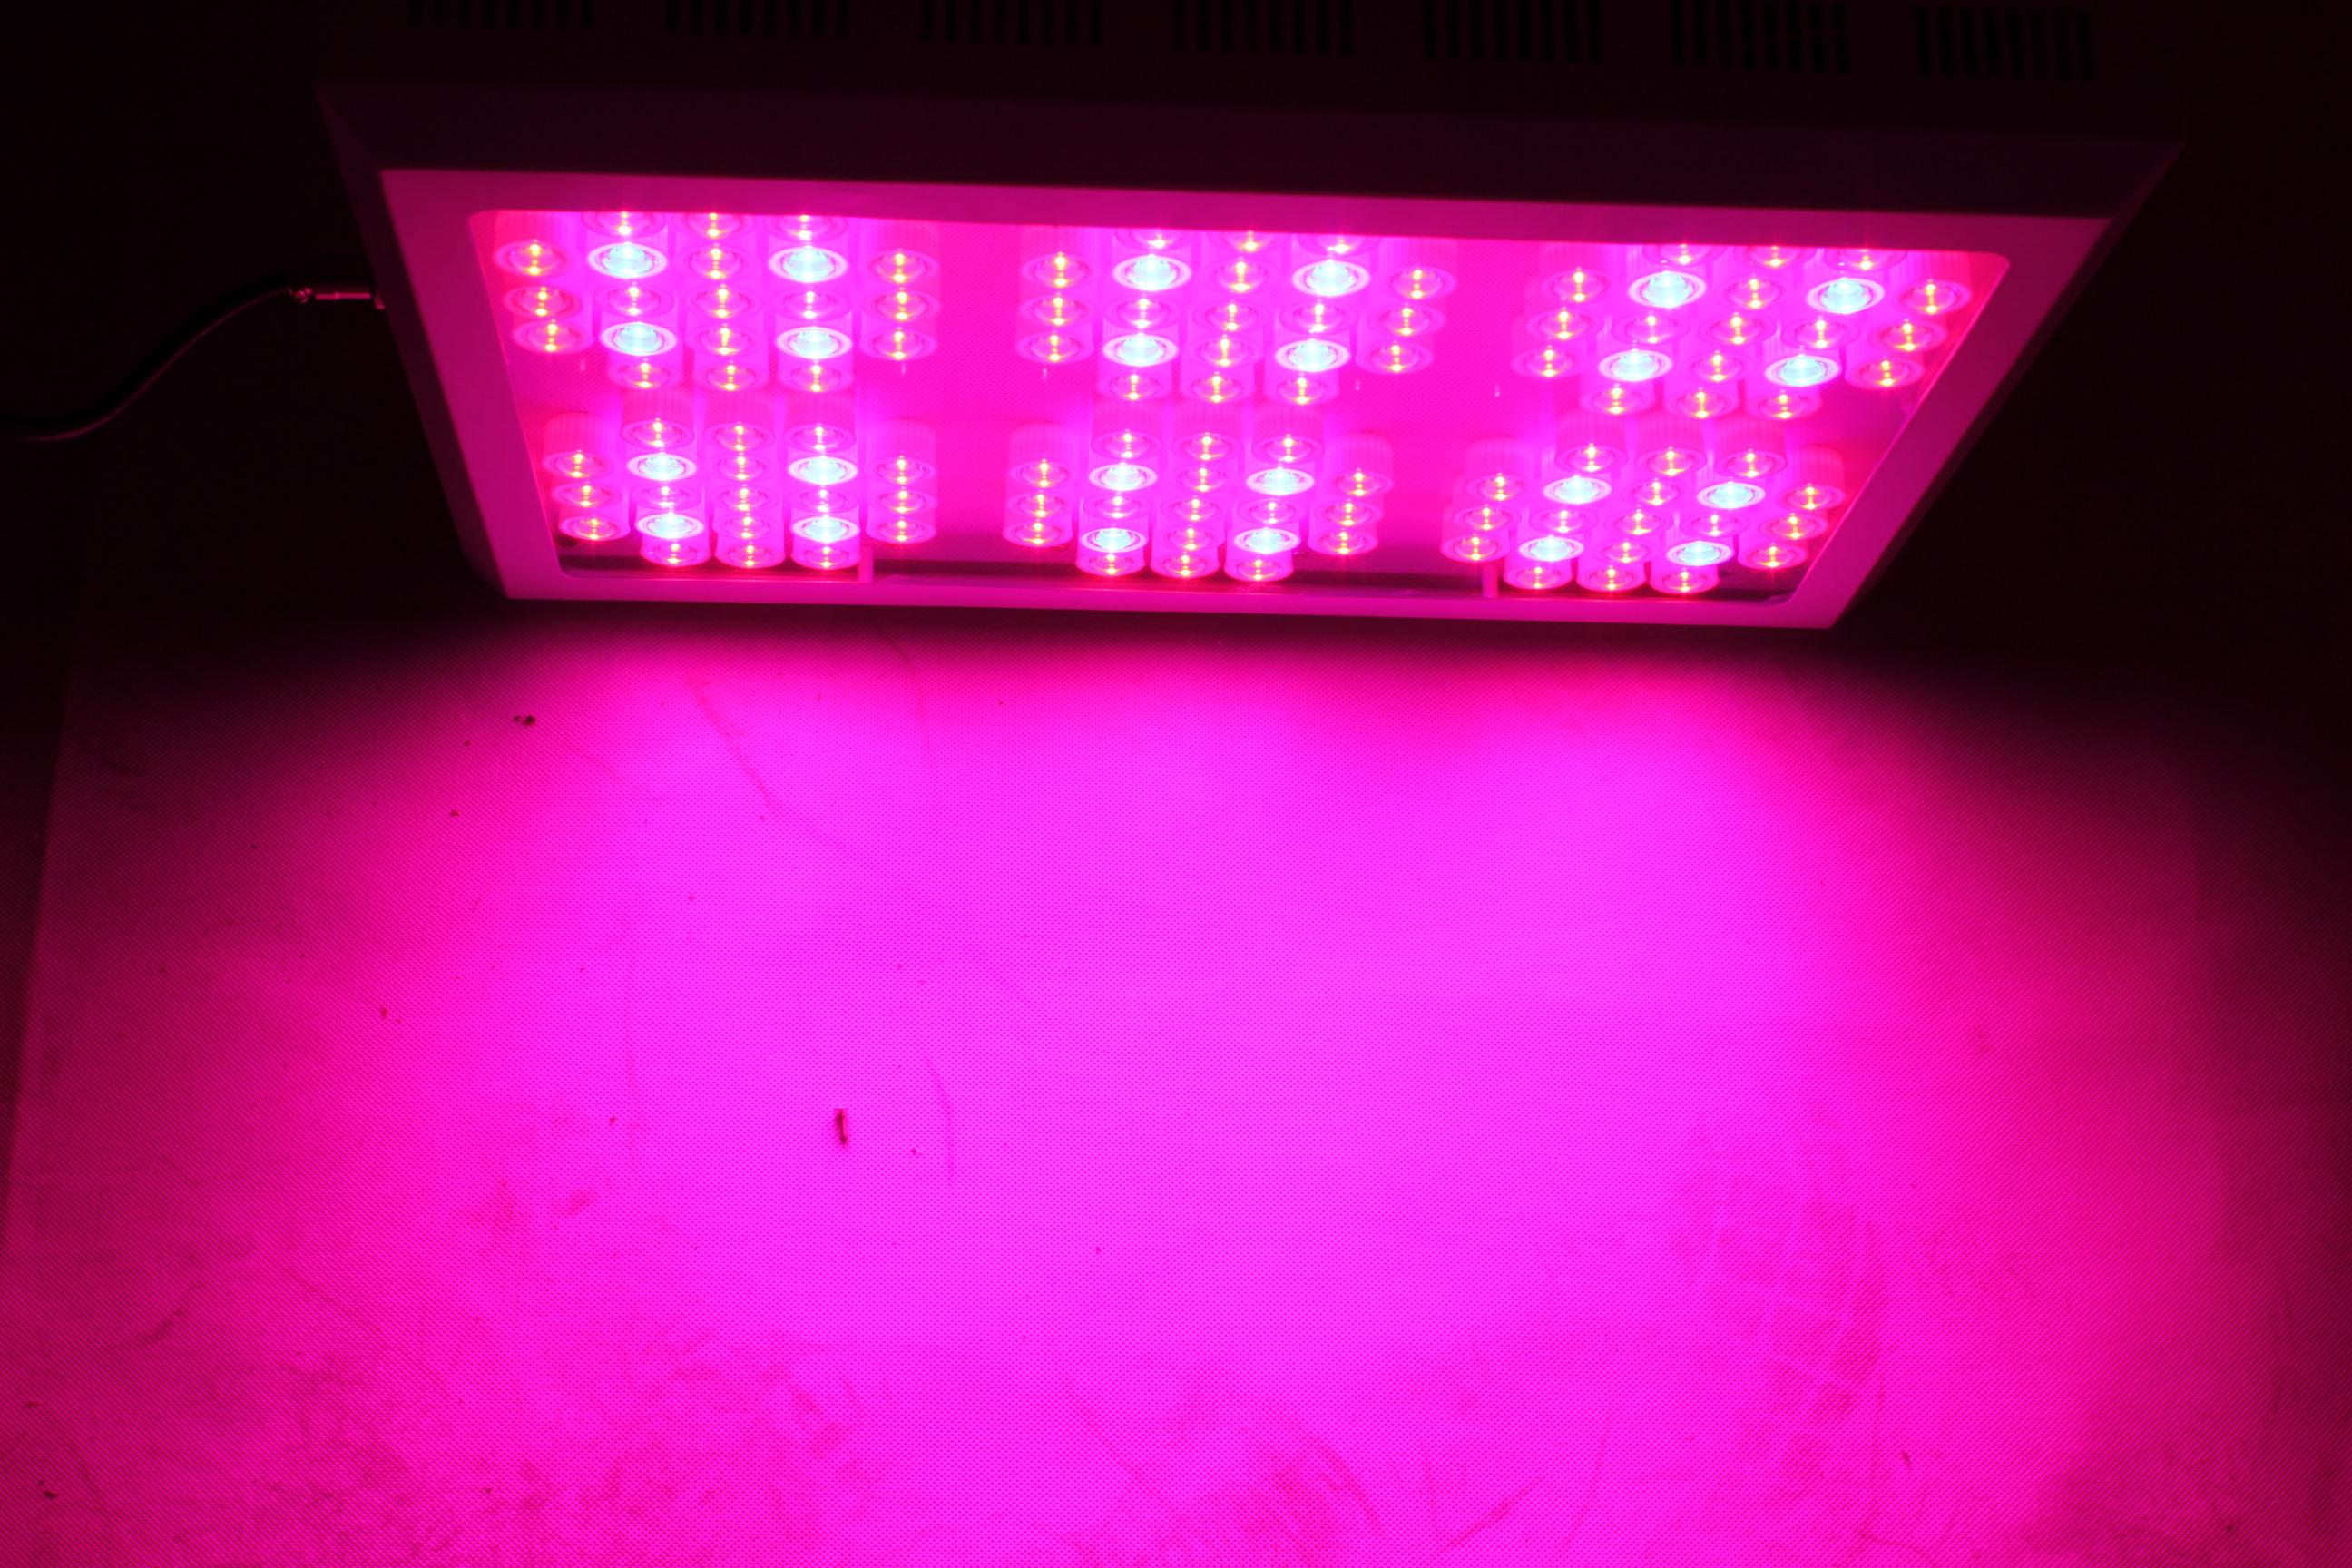 LED GROW LIGHT 360W ไฟสำหรับปลูกต้นไม้,Hydroponic